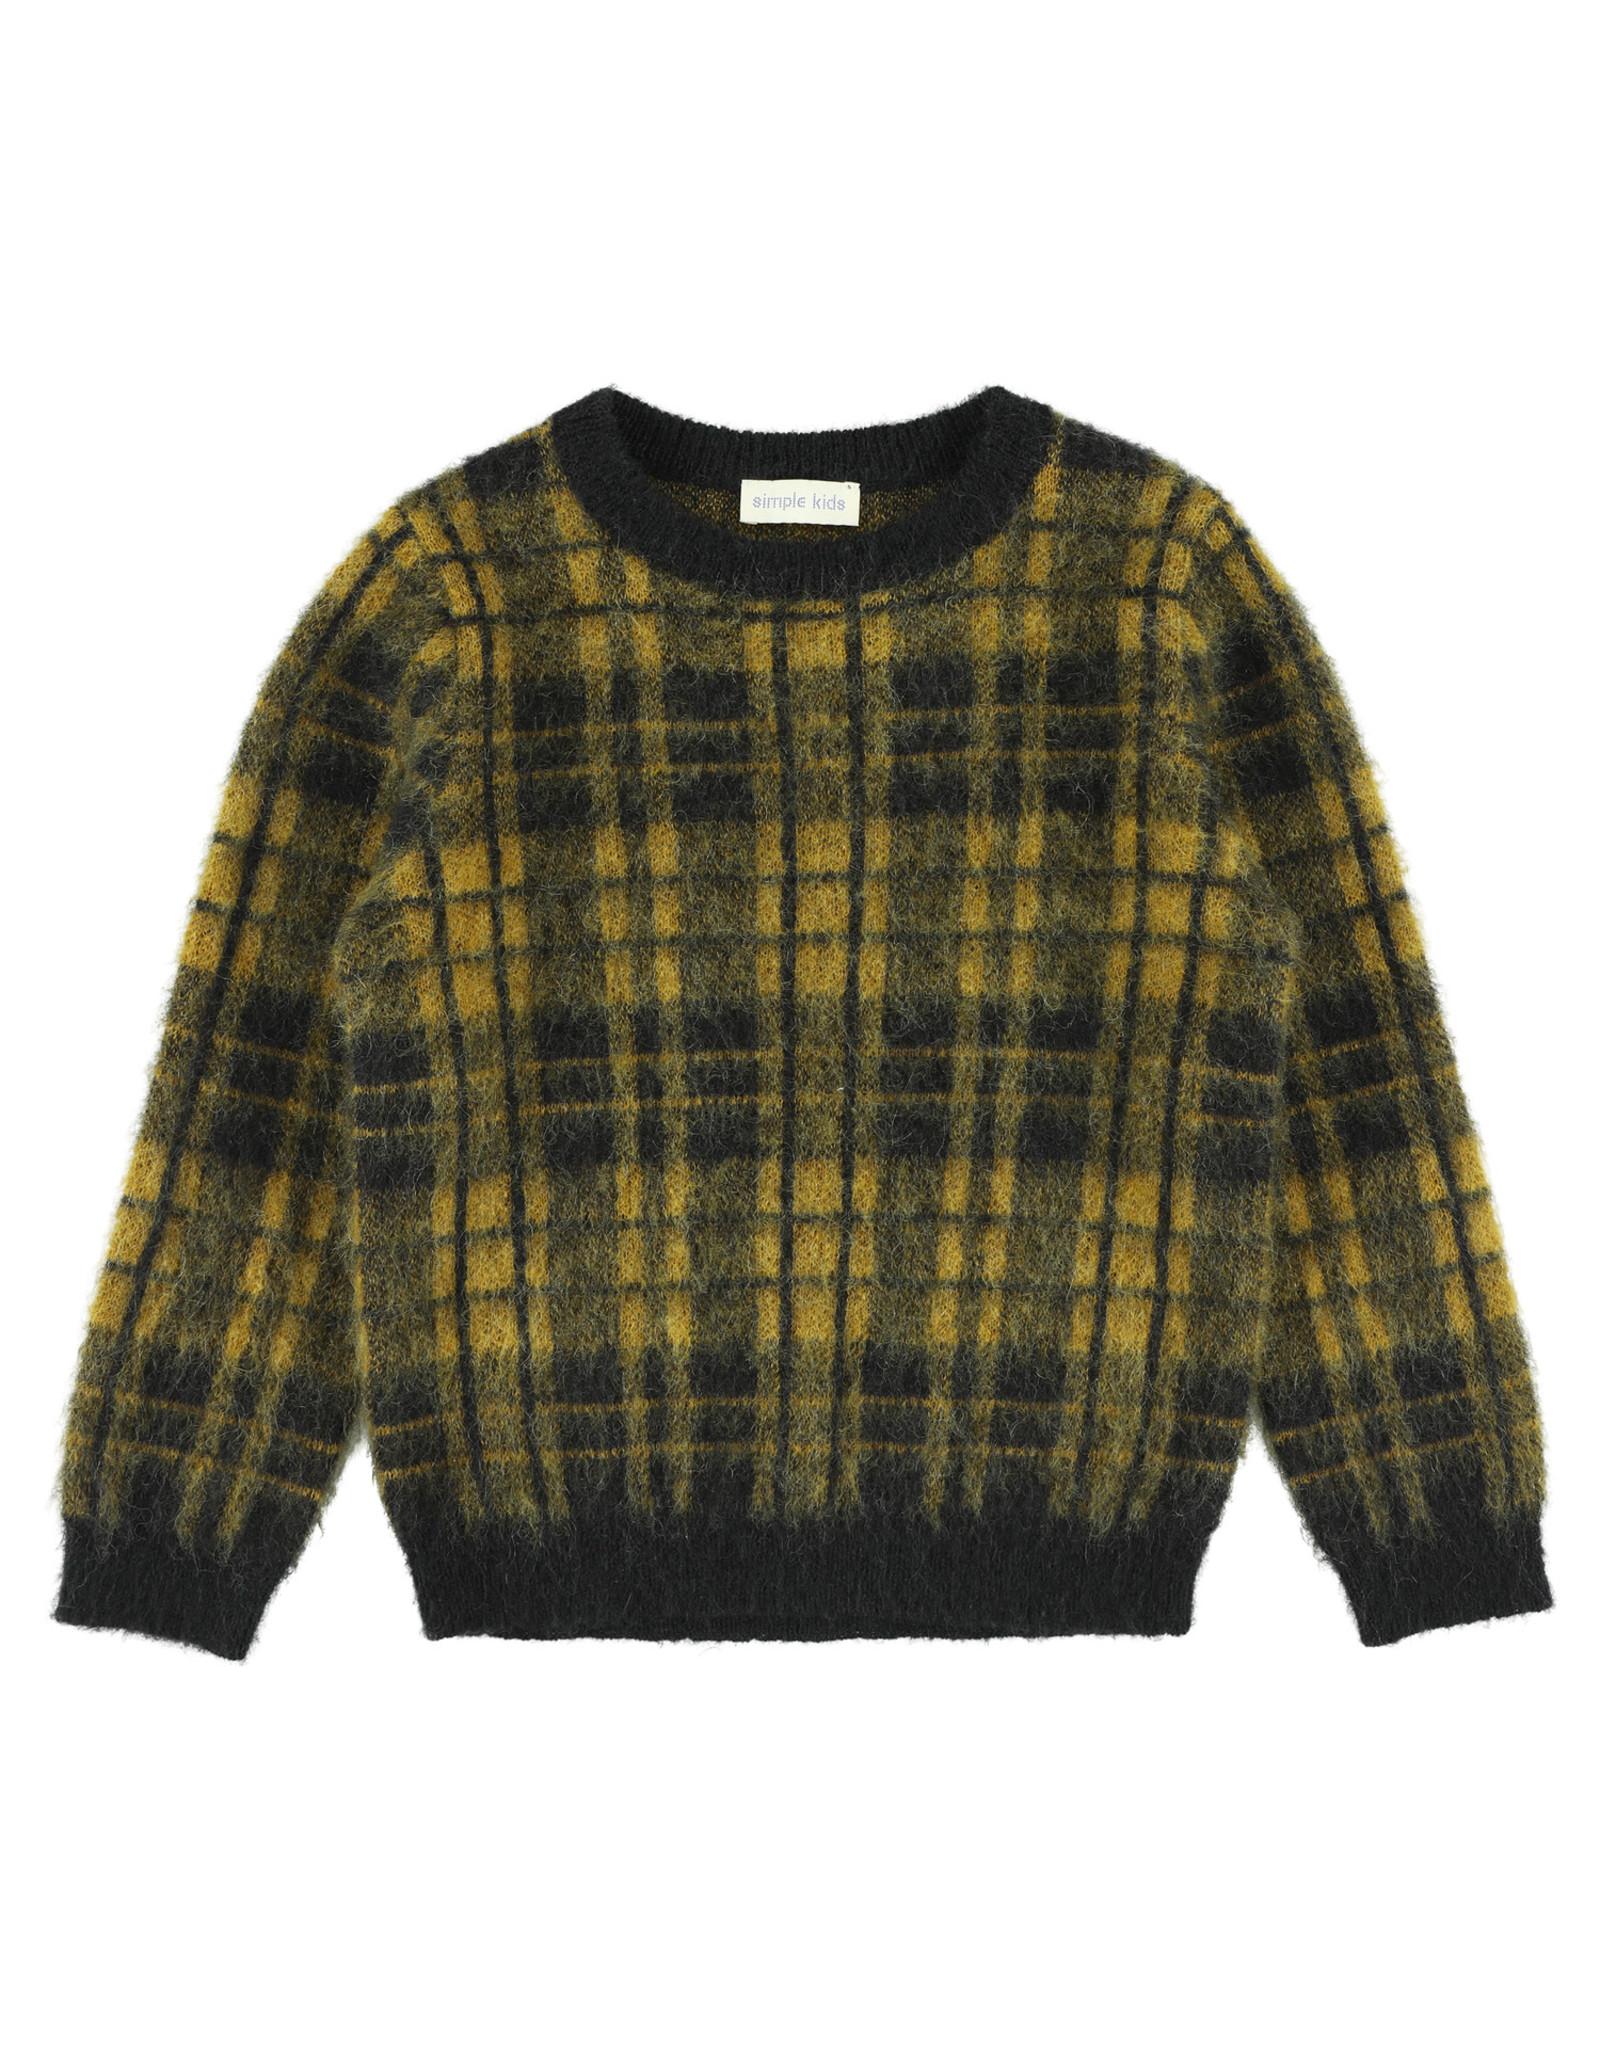 Simple Kids Allspice Soft mustard pullover